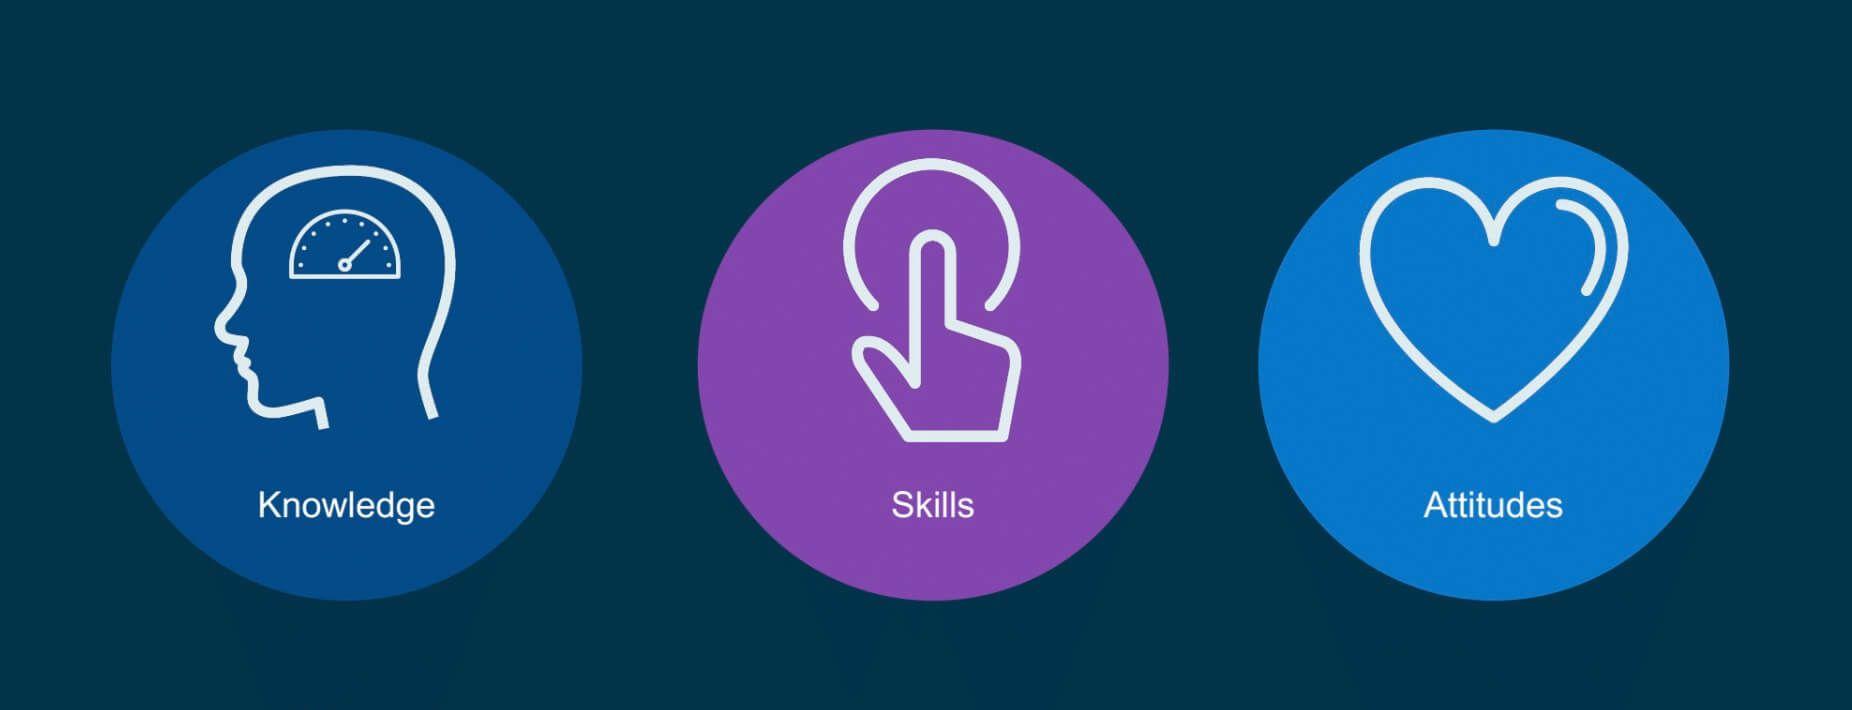 Knowledge, skills, attitudes